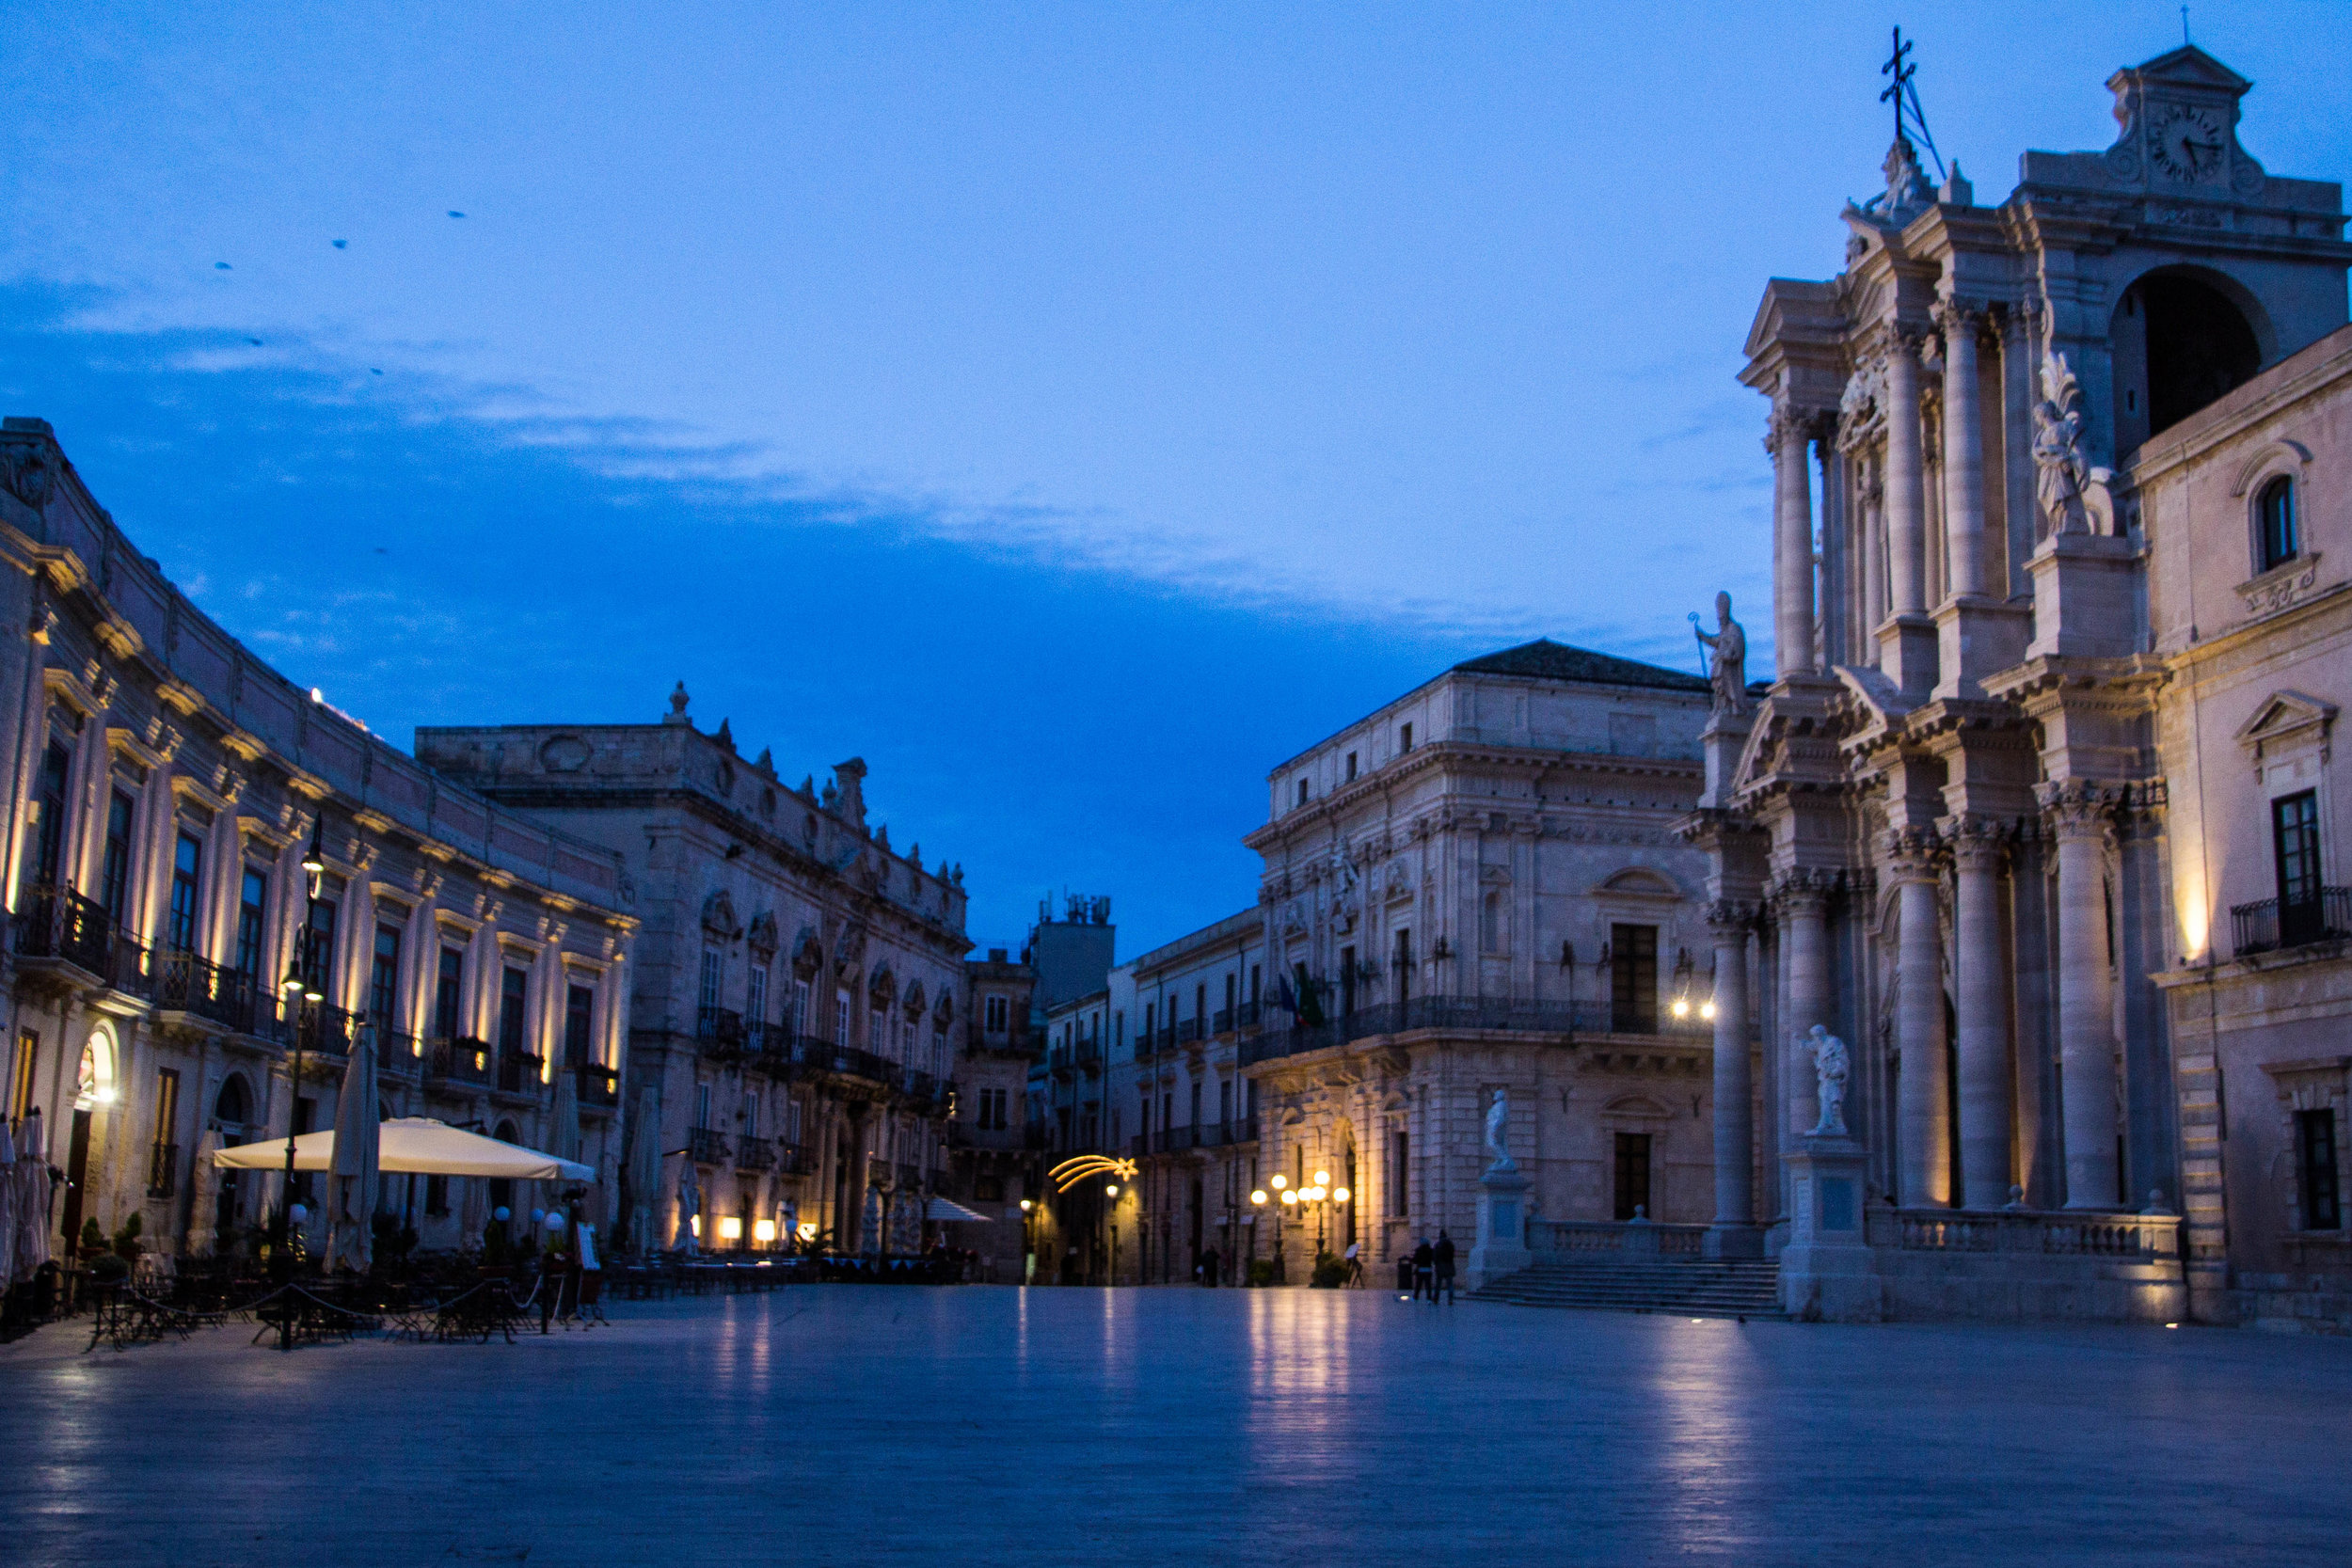 piazza-duomo-sunset-ortygia-syracuse-sicily-25.jpg